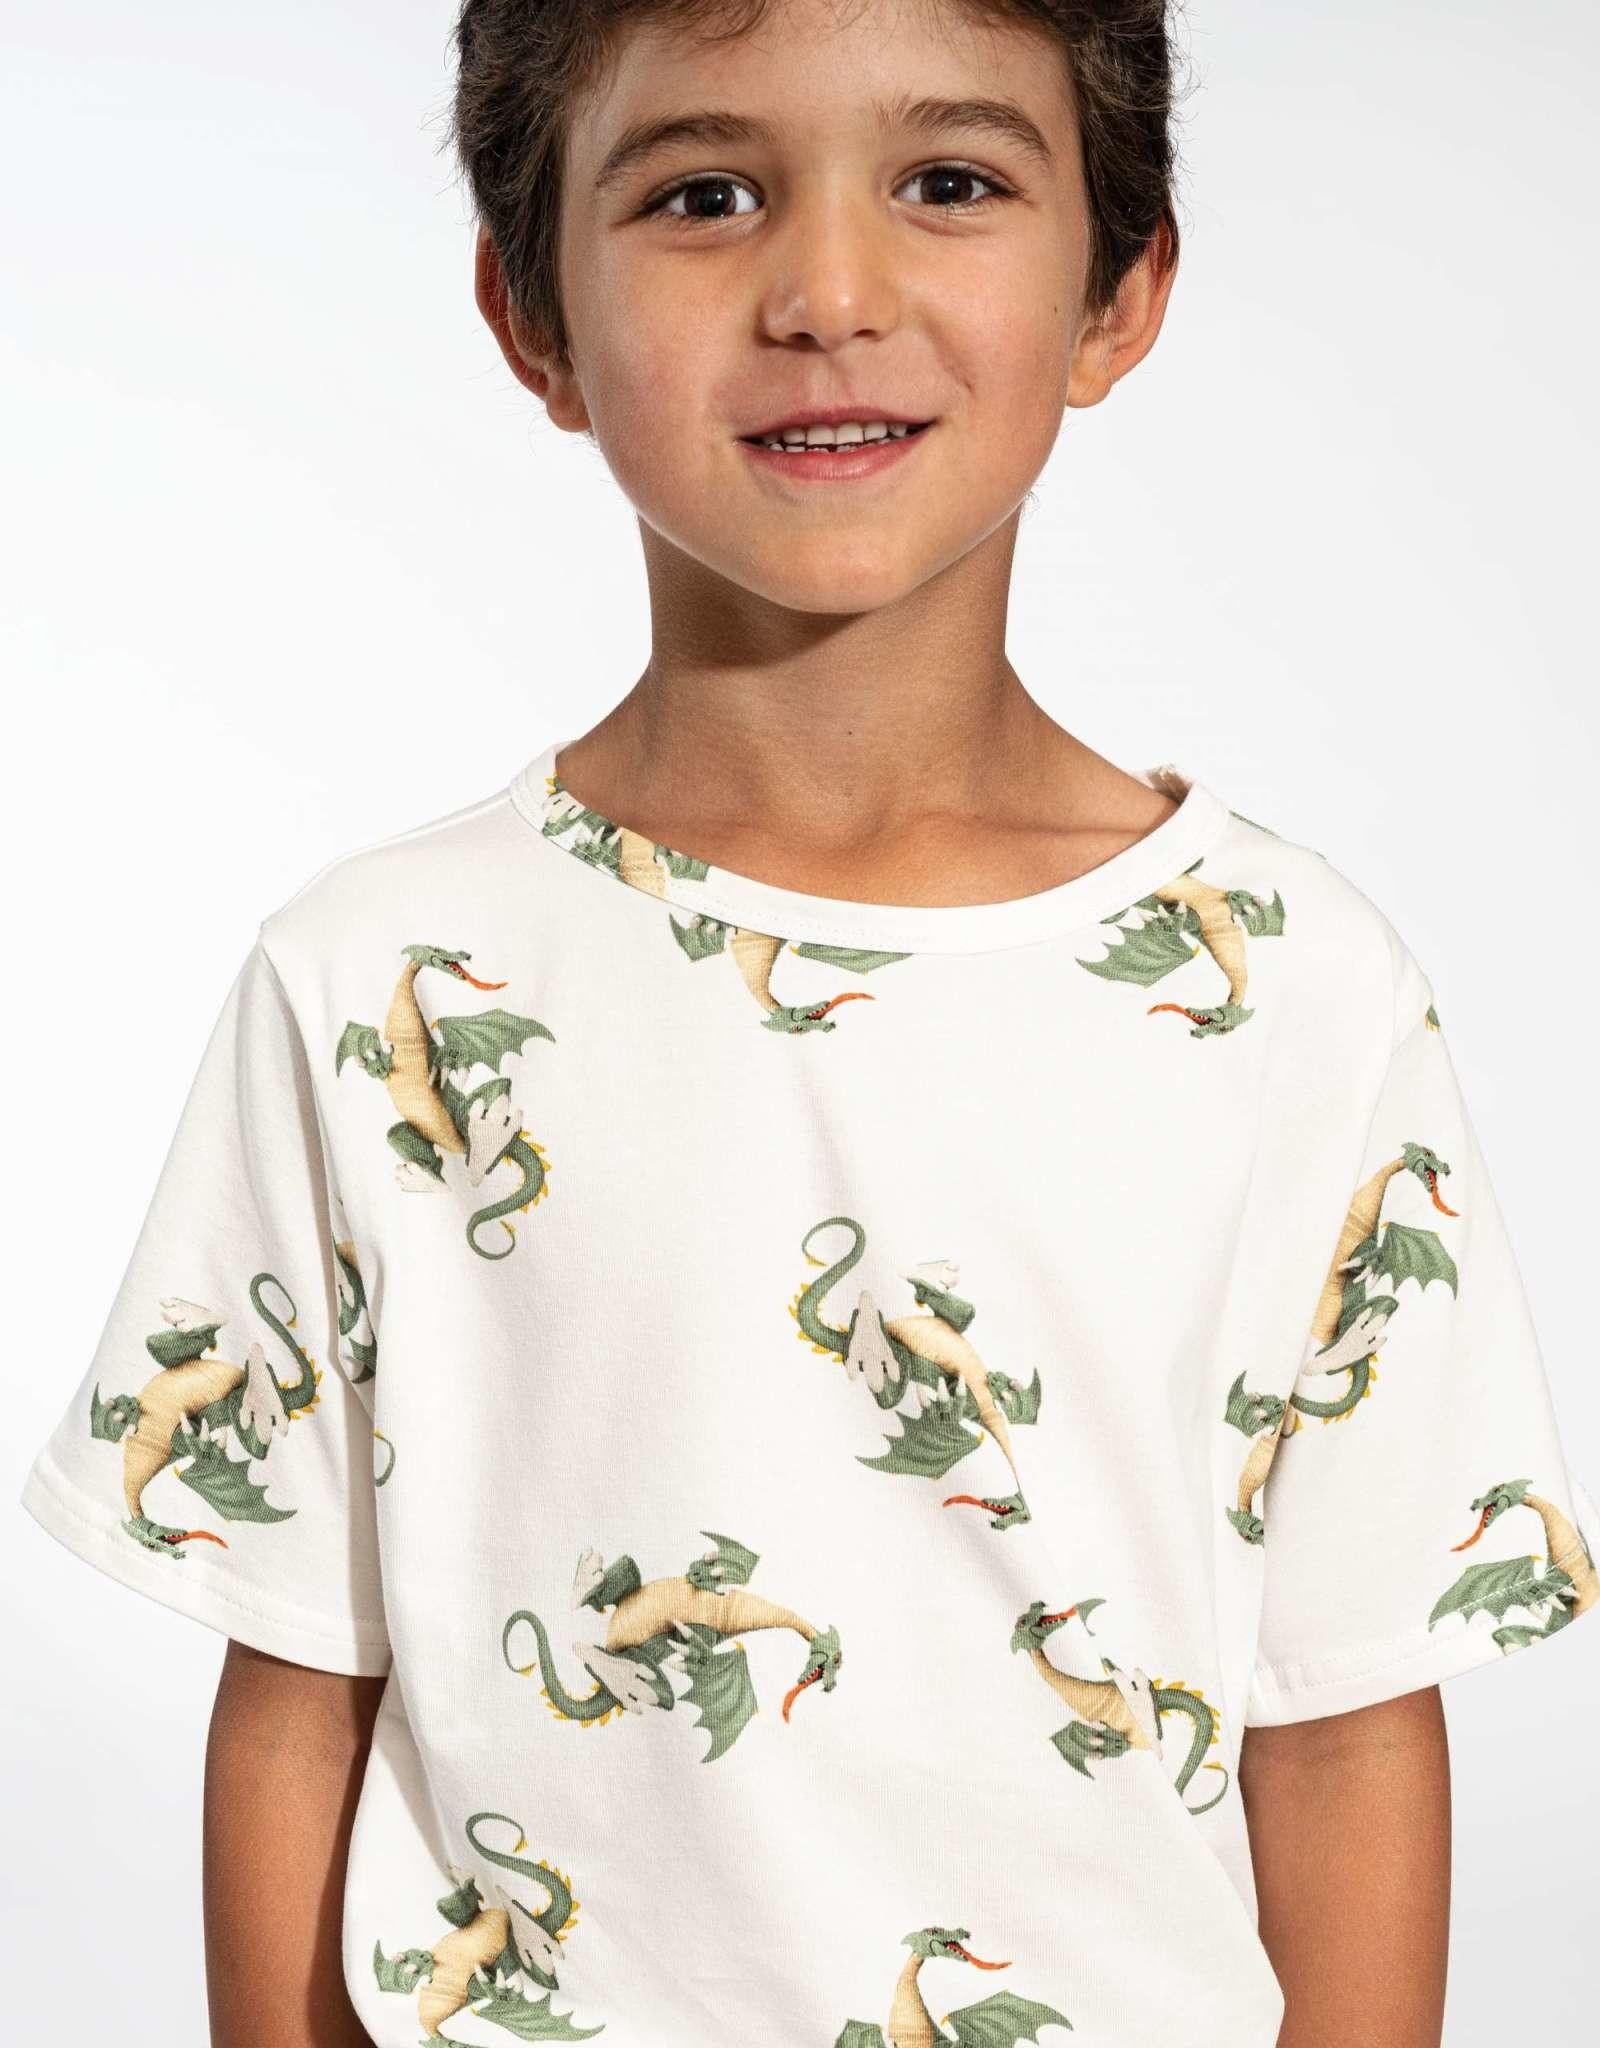 Snurk Snurk Dragon T-shirt Kids